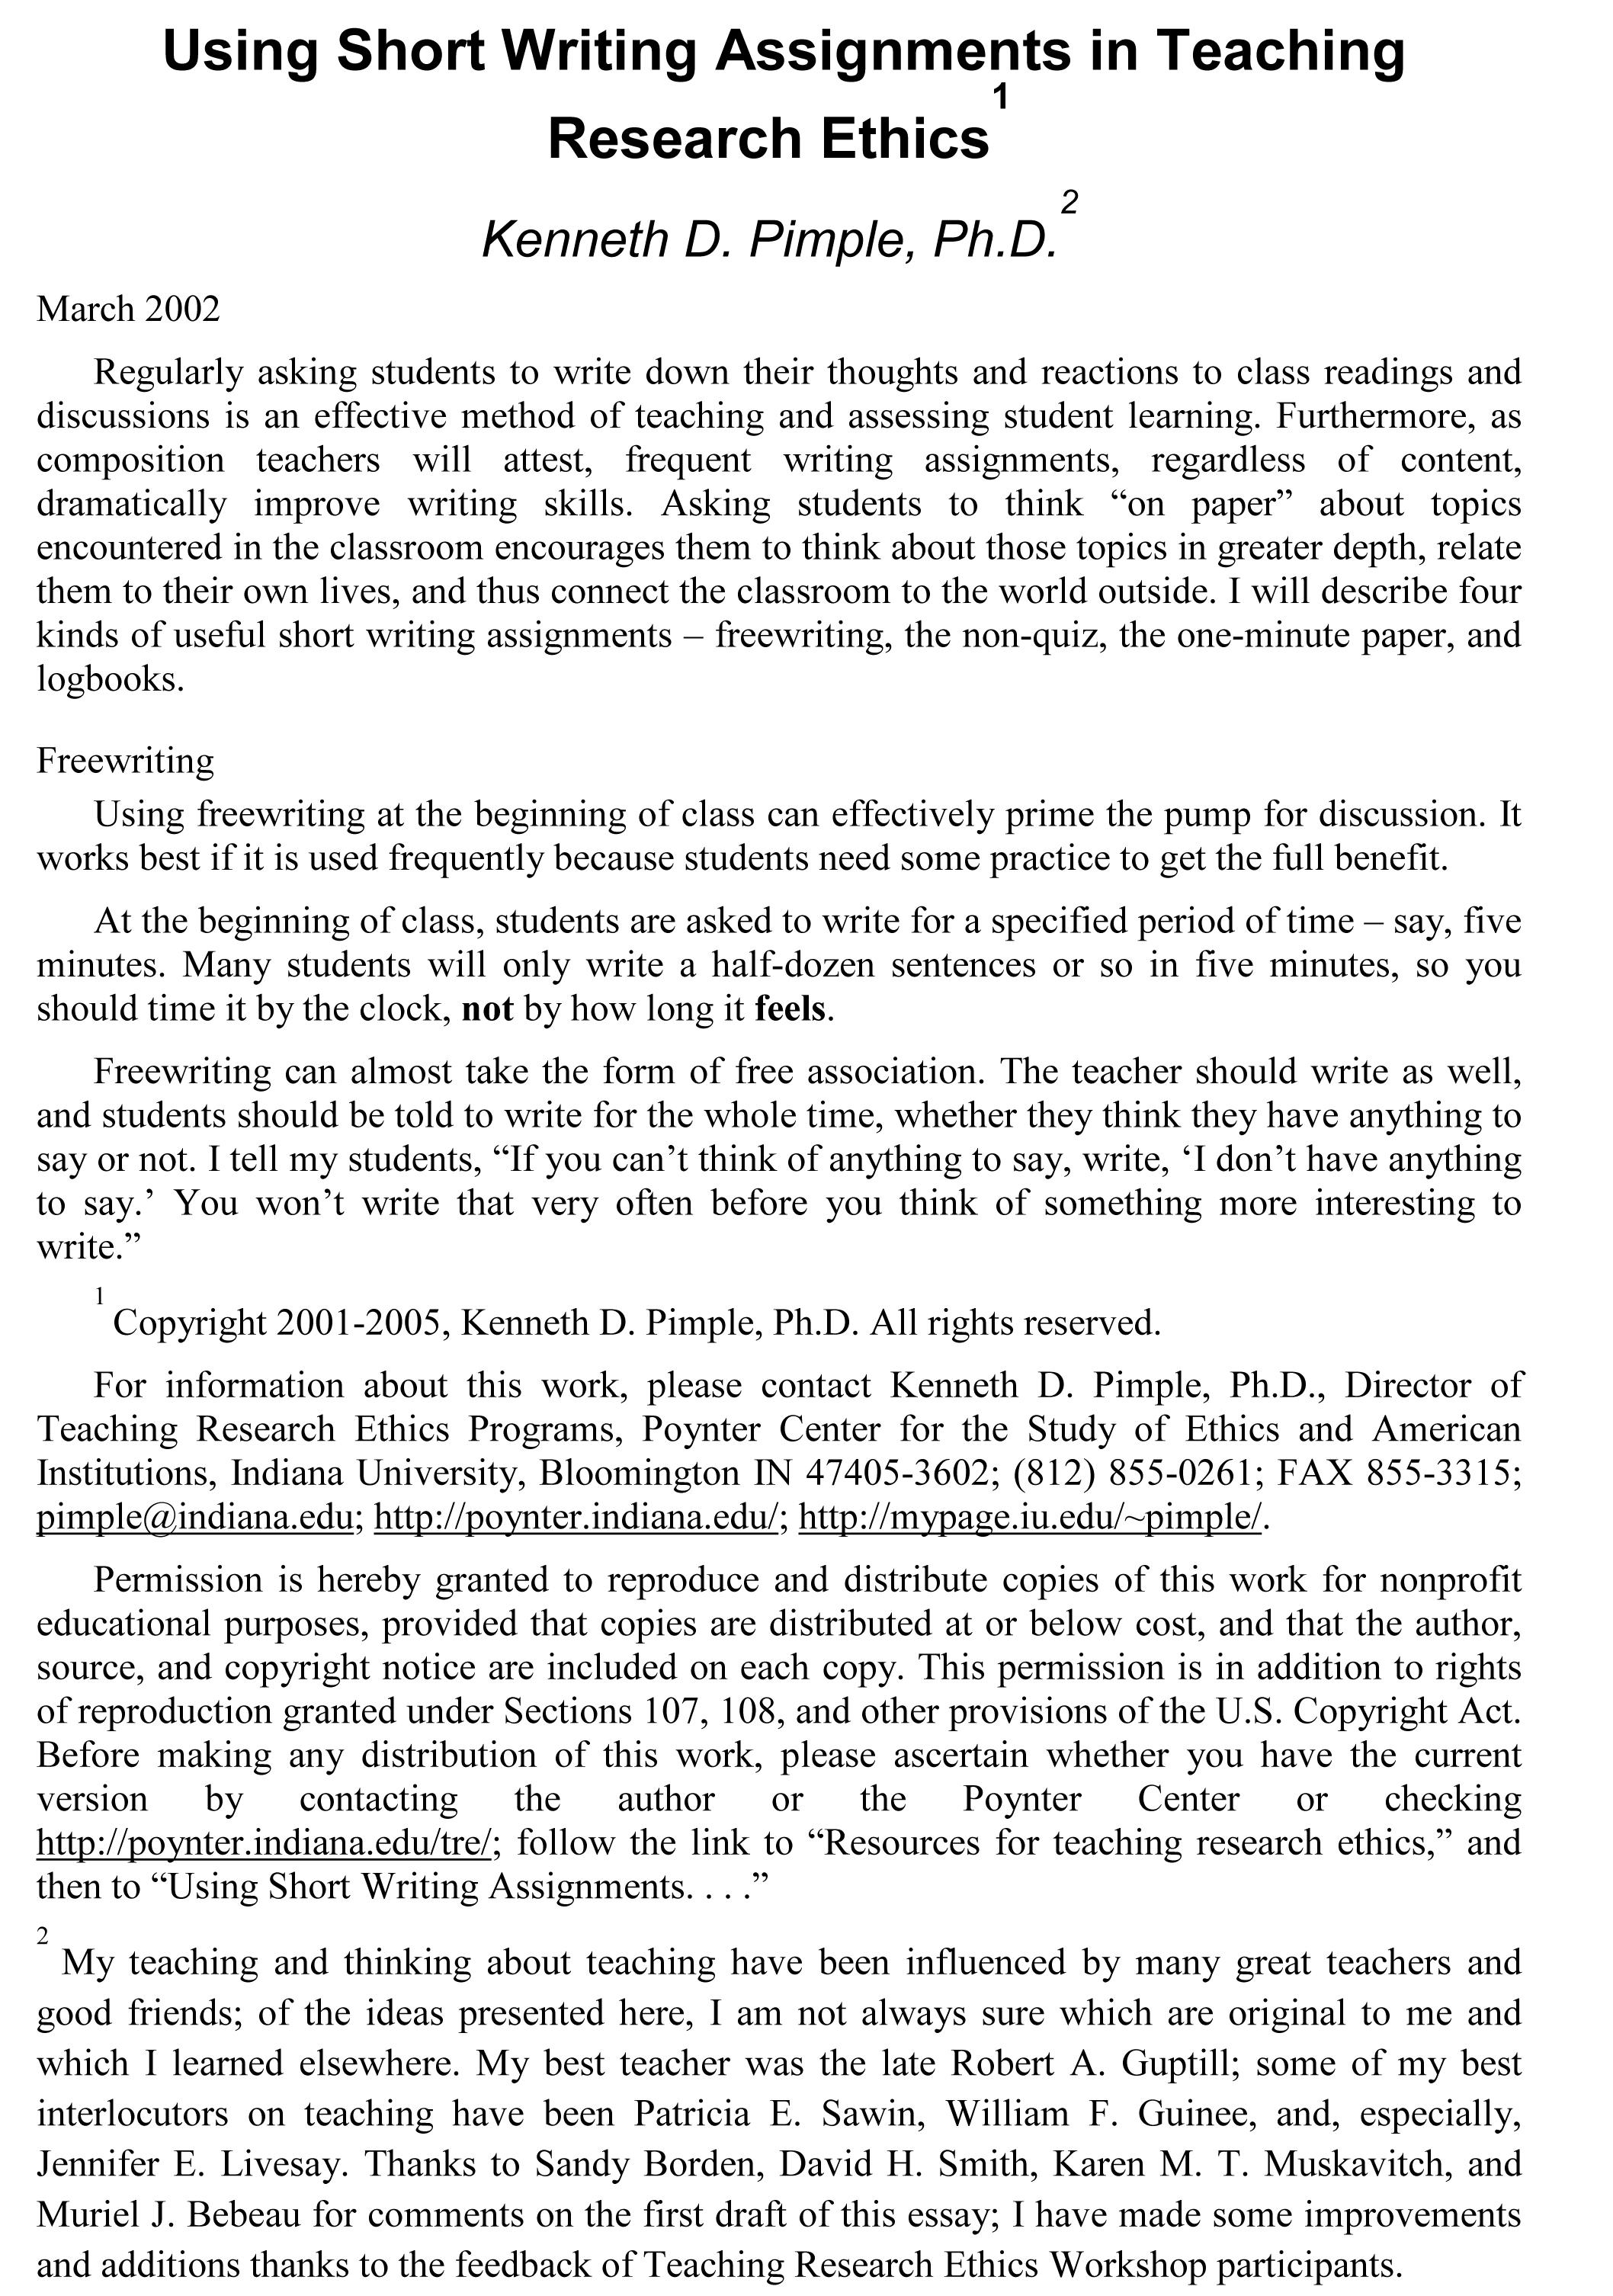 002 Sample Teaching College Essay Writing Imposing Service Reddit Custom Application Help Full